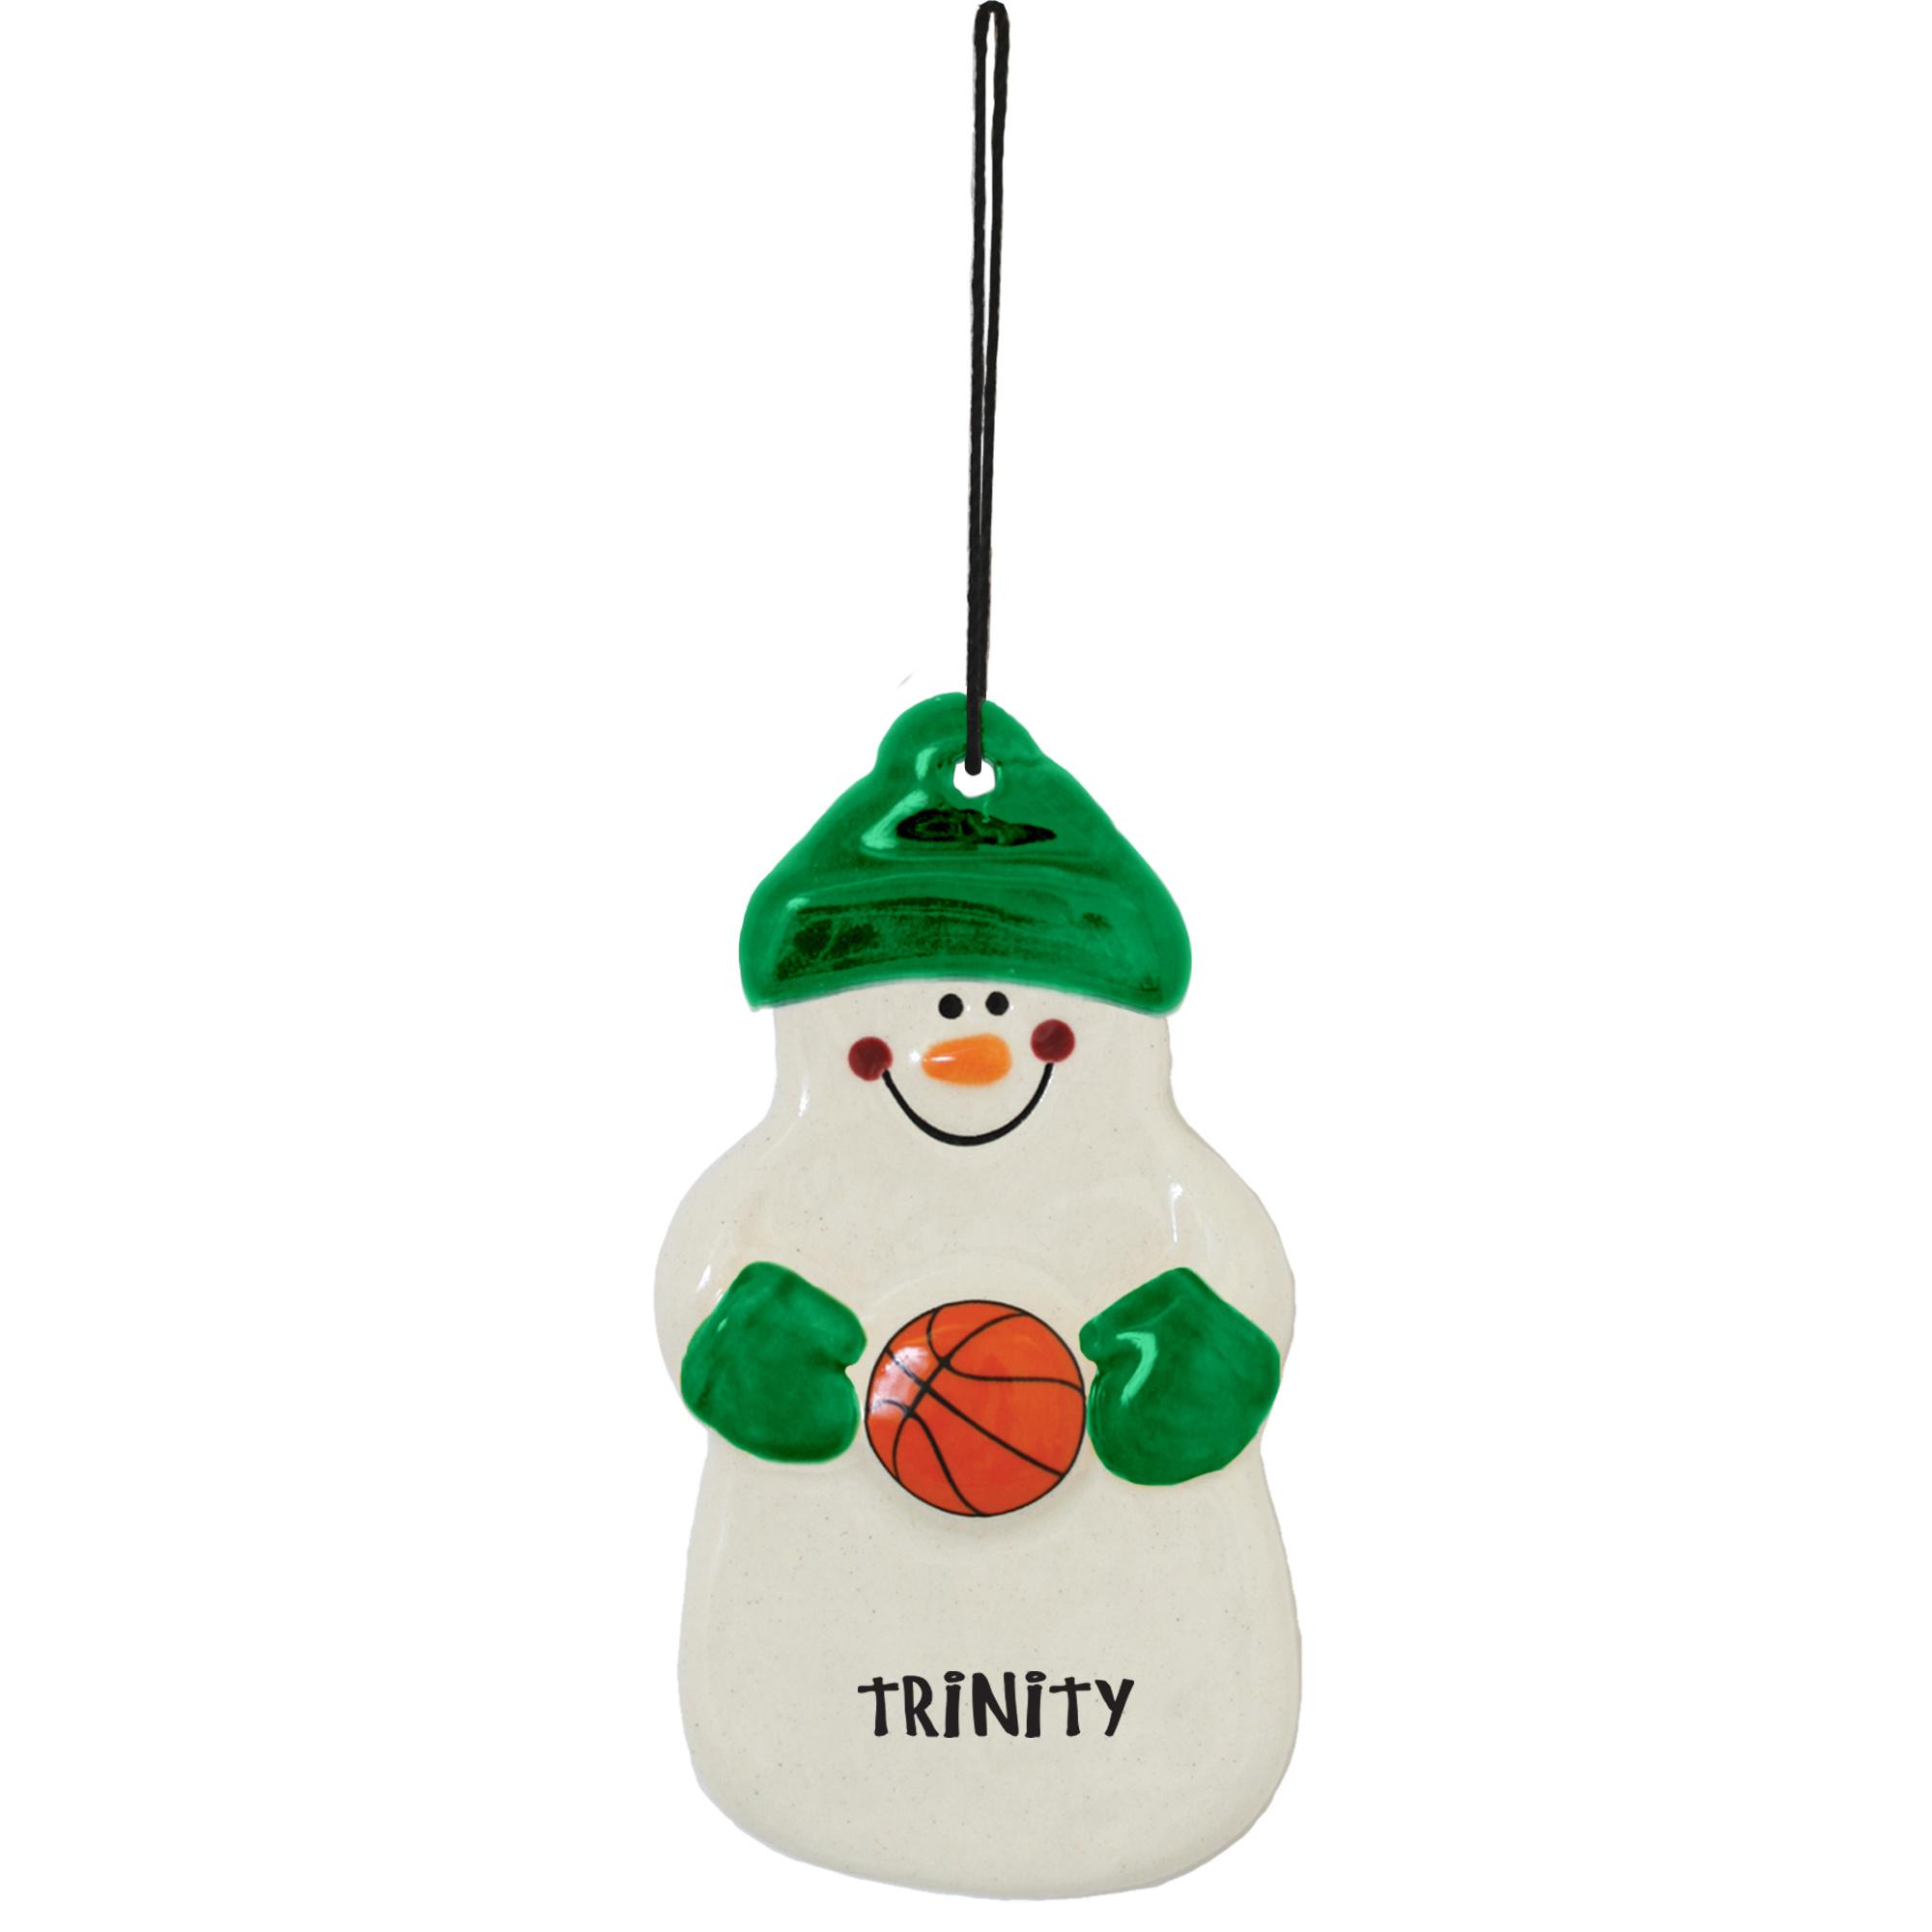 Spirit Products Snowman Ornament Basketball